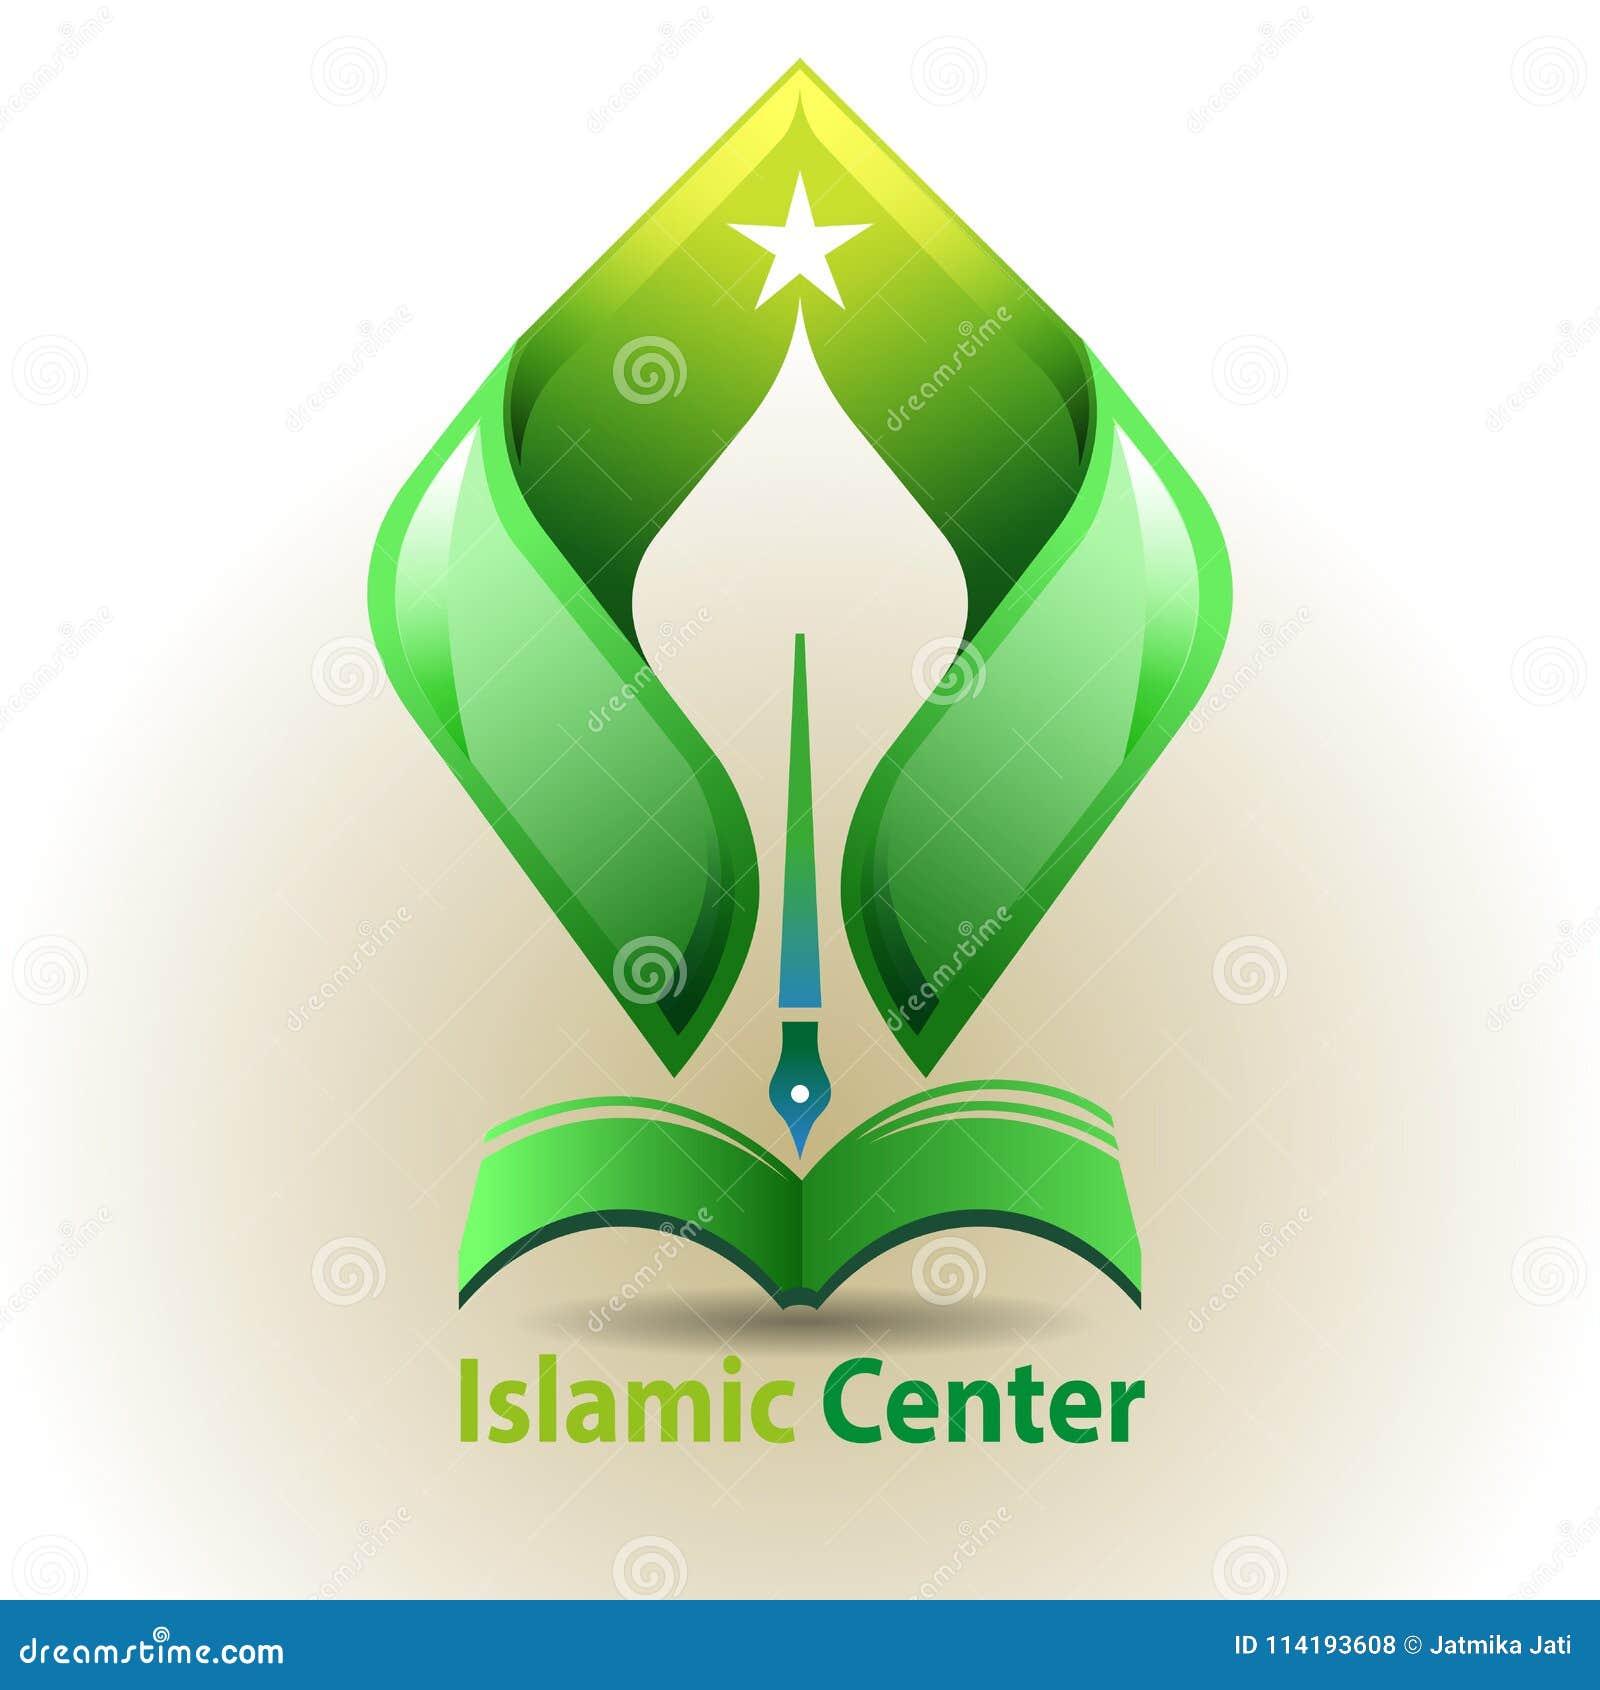 Islamic Learning Center Symbol Stock Vector Illustration Of Read